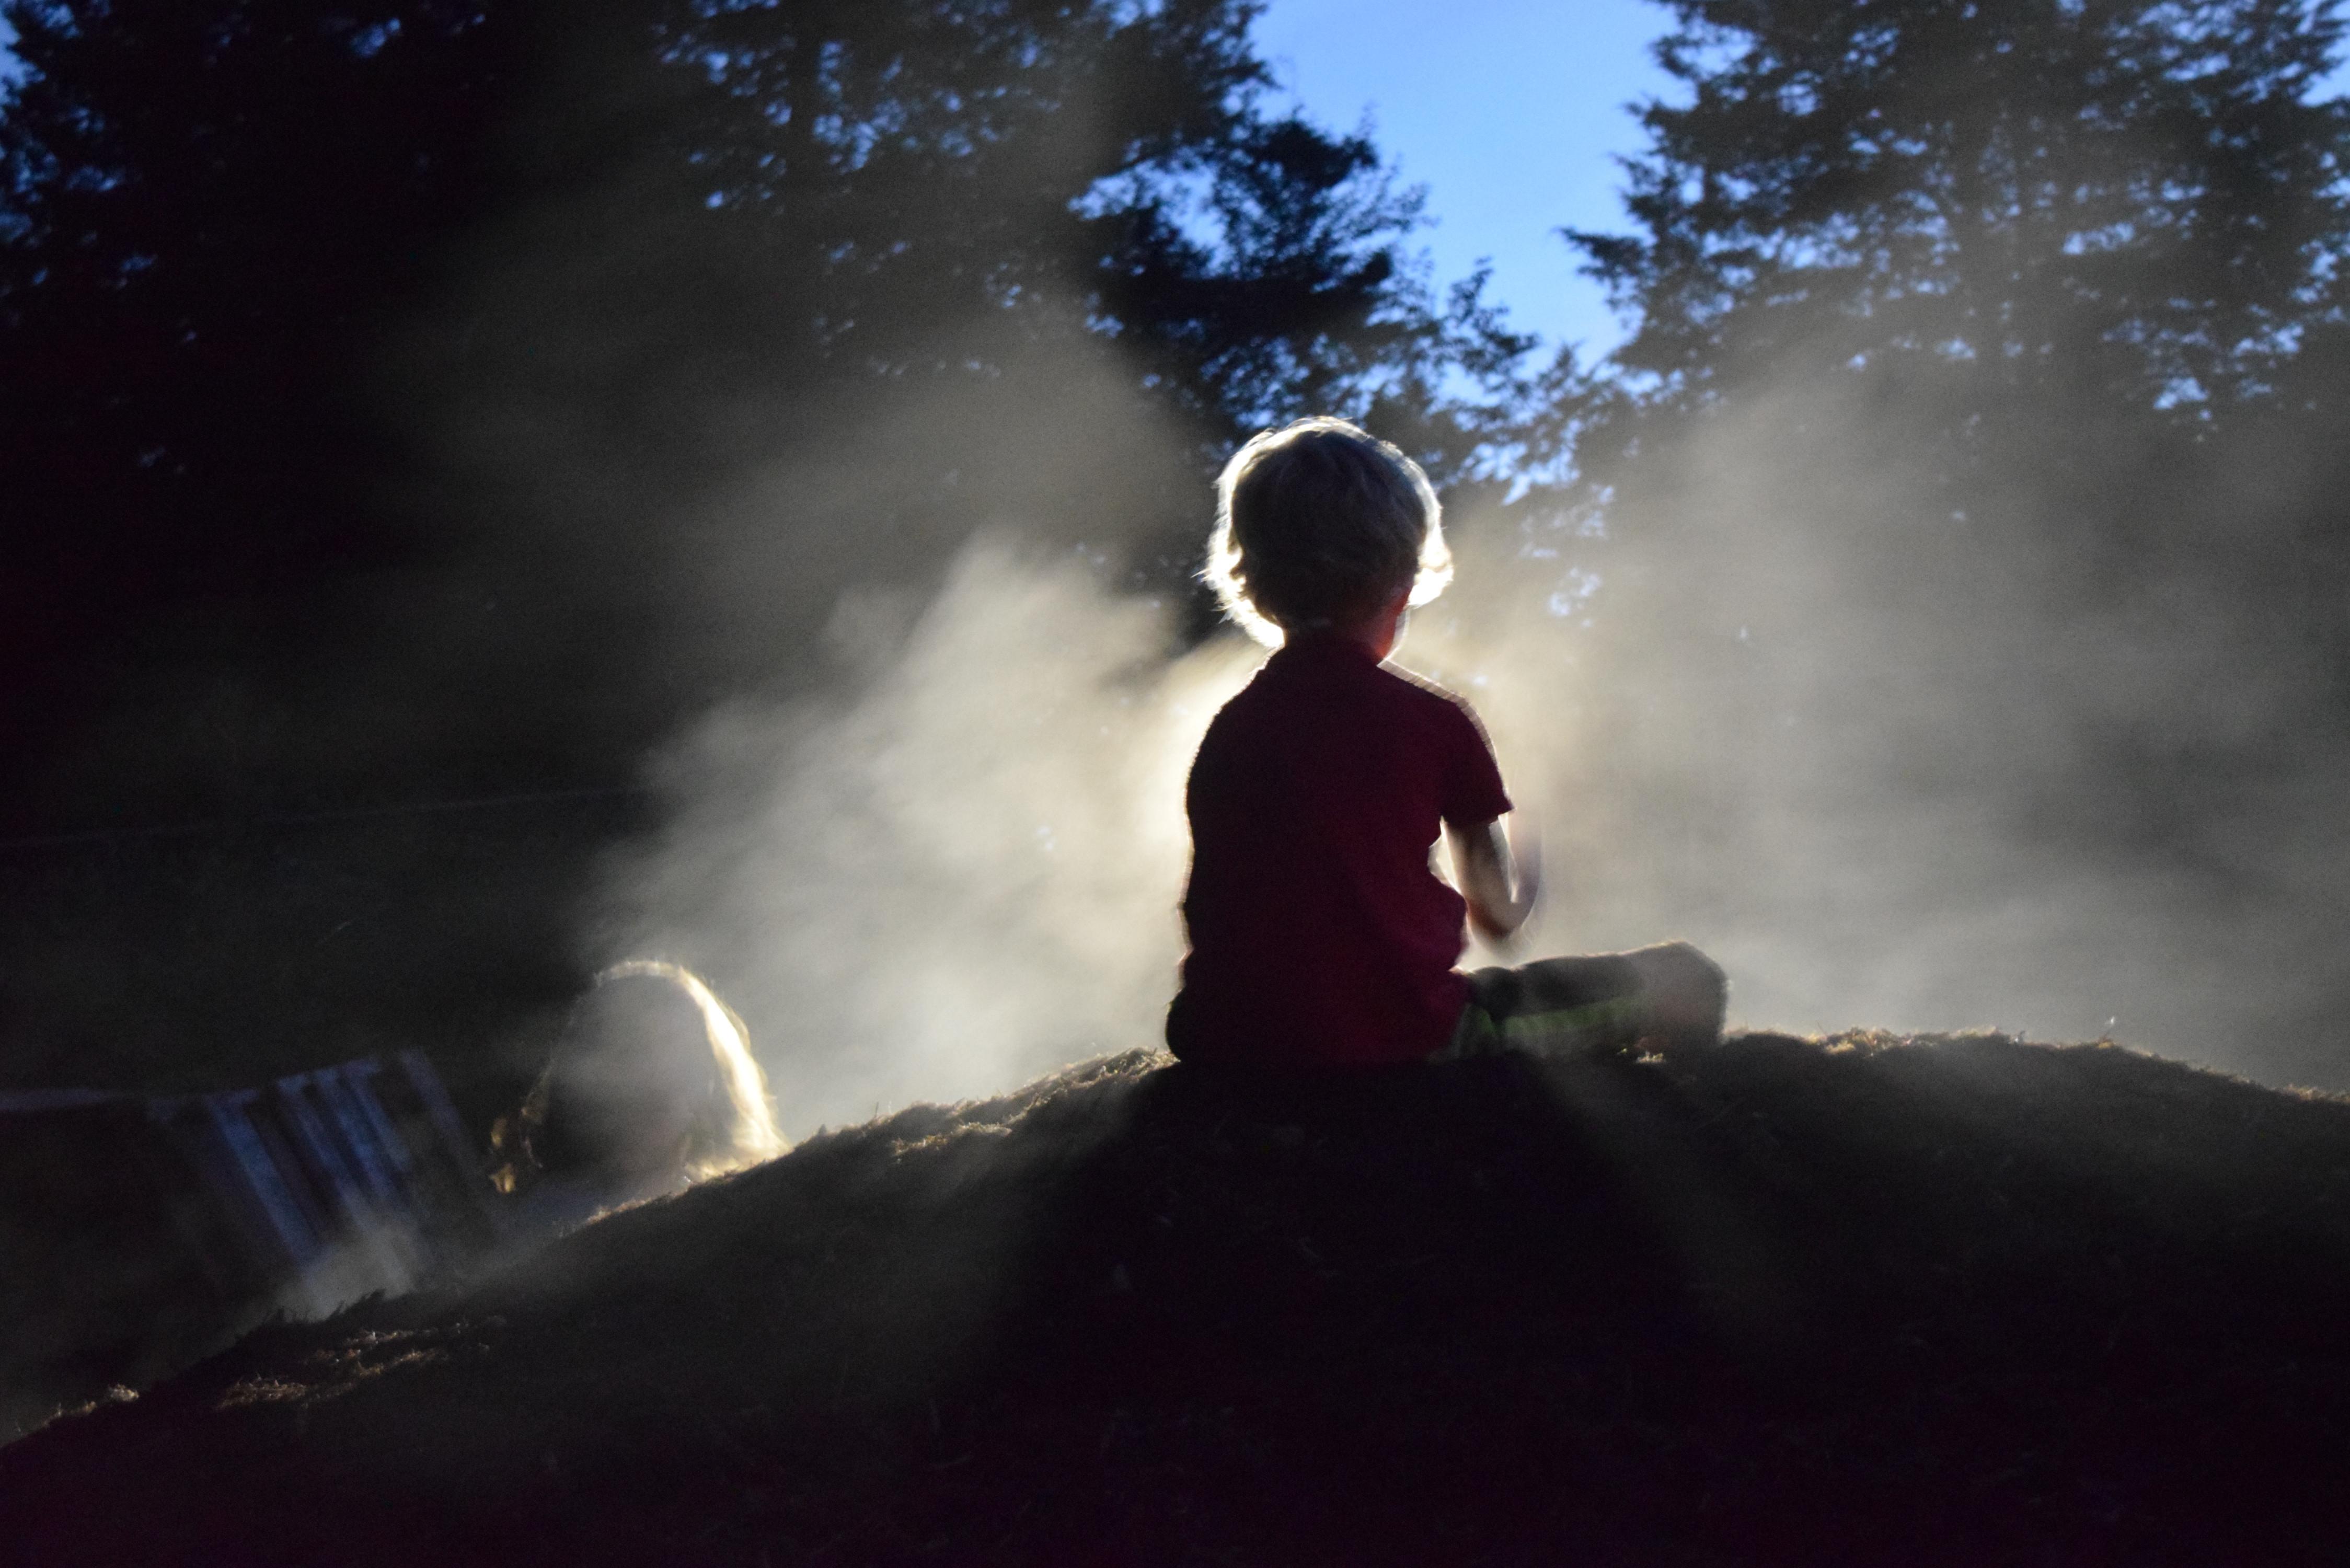 Farmstead New Moon Night (7/10)